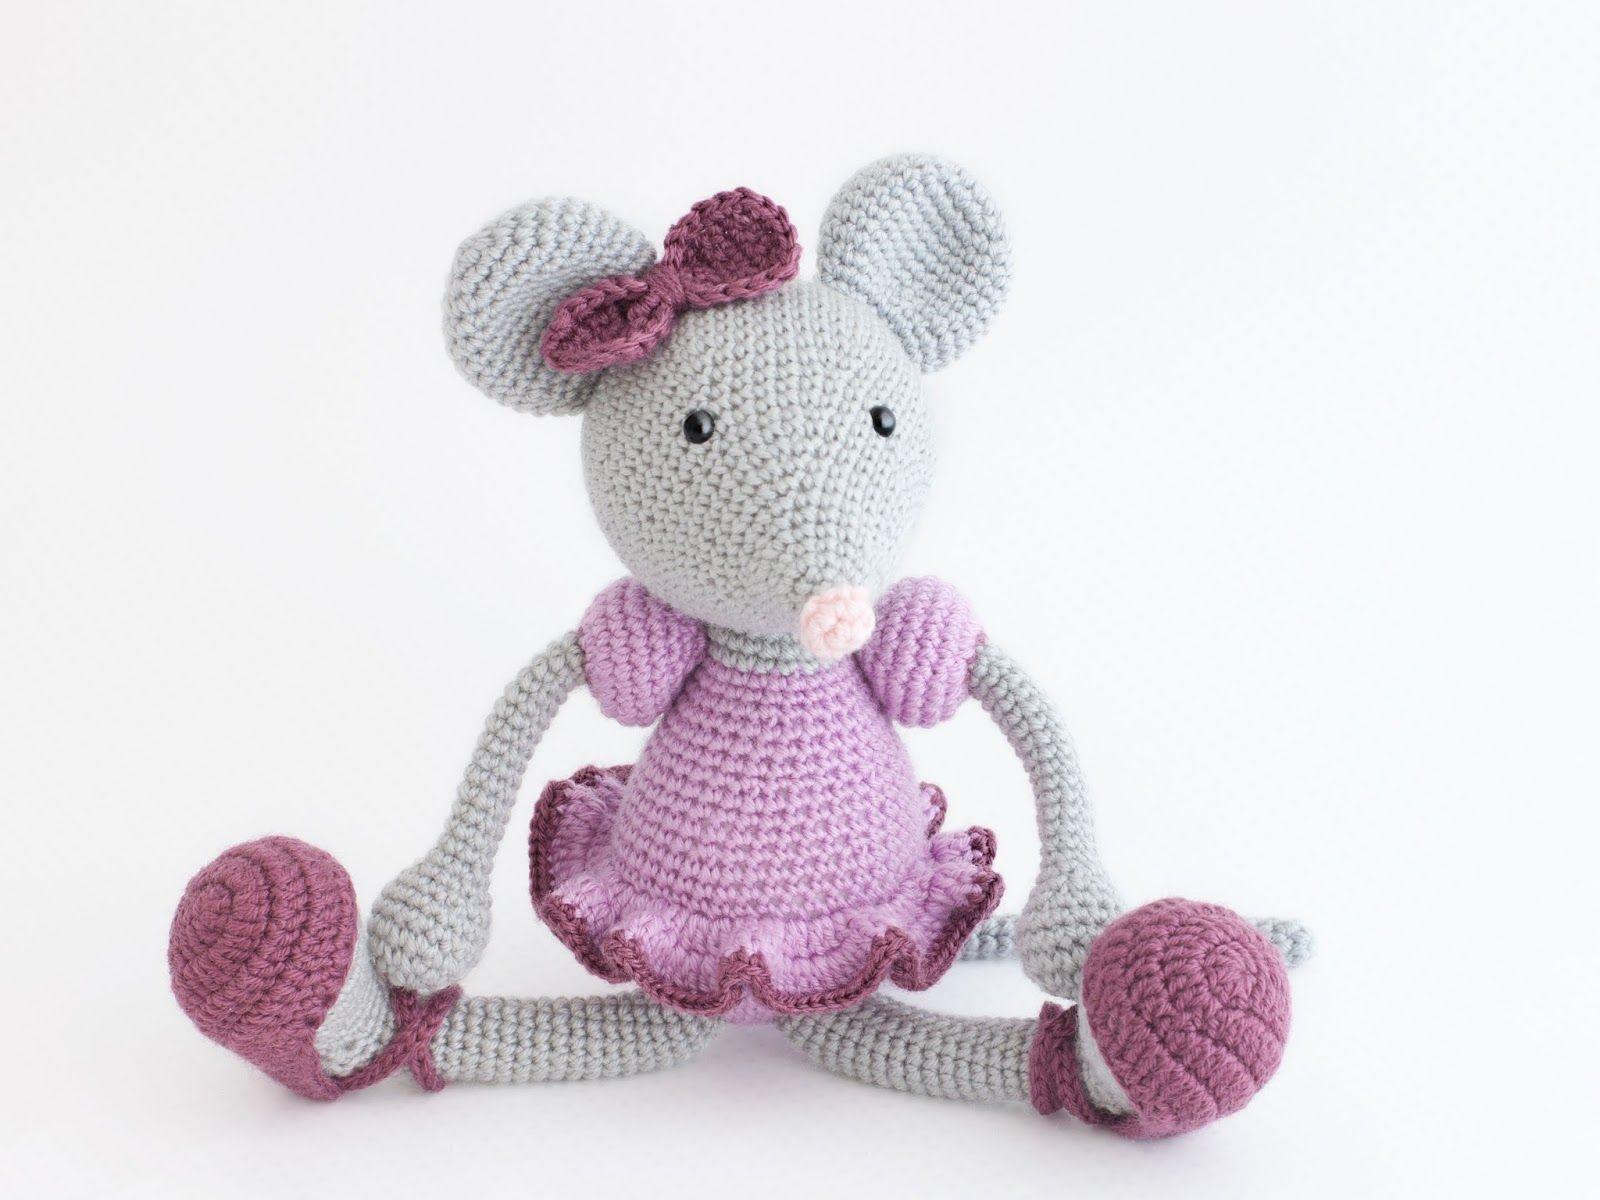 Amigurumi ratita bailarina | Crochet Toys | Pinterest | Bailarines ...